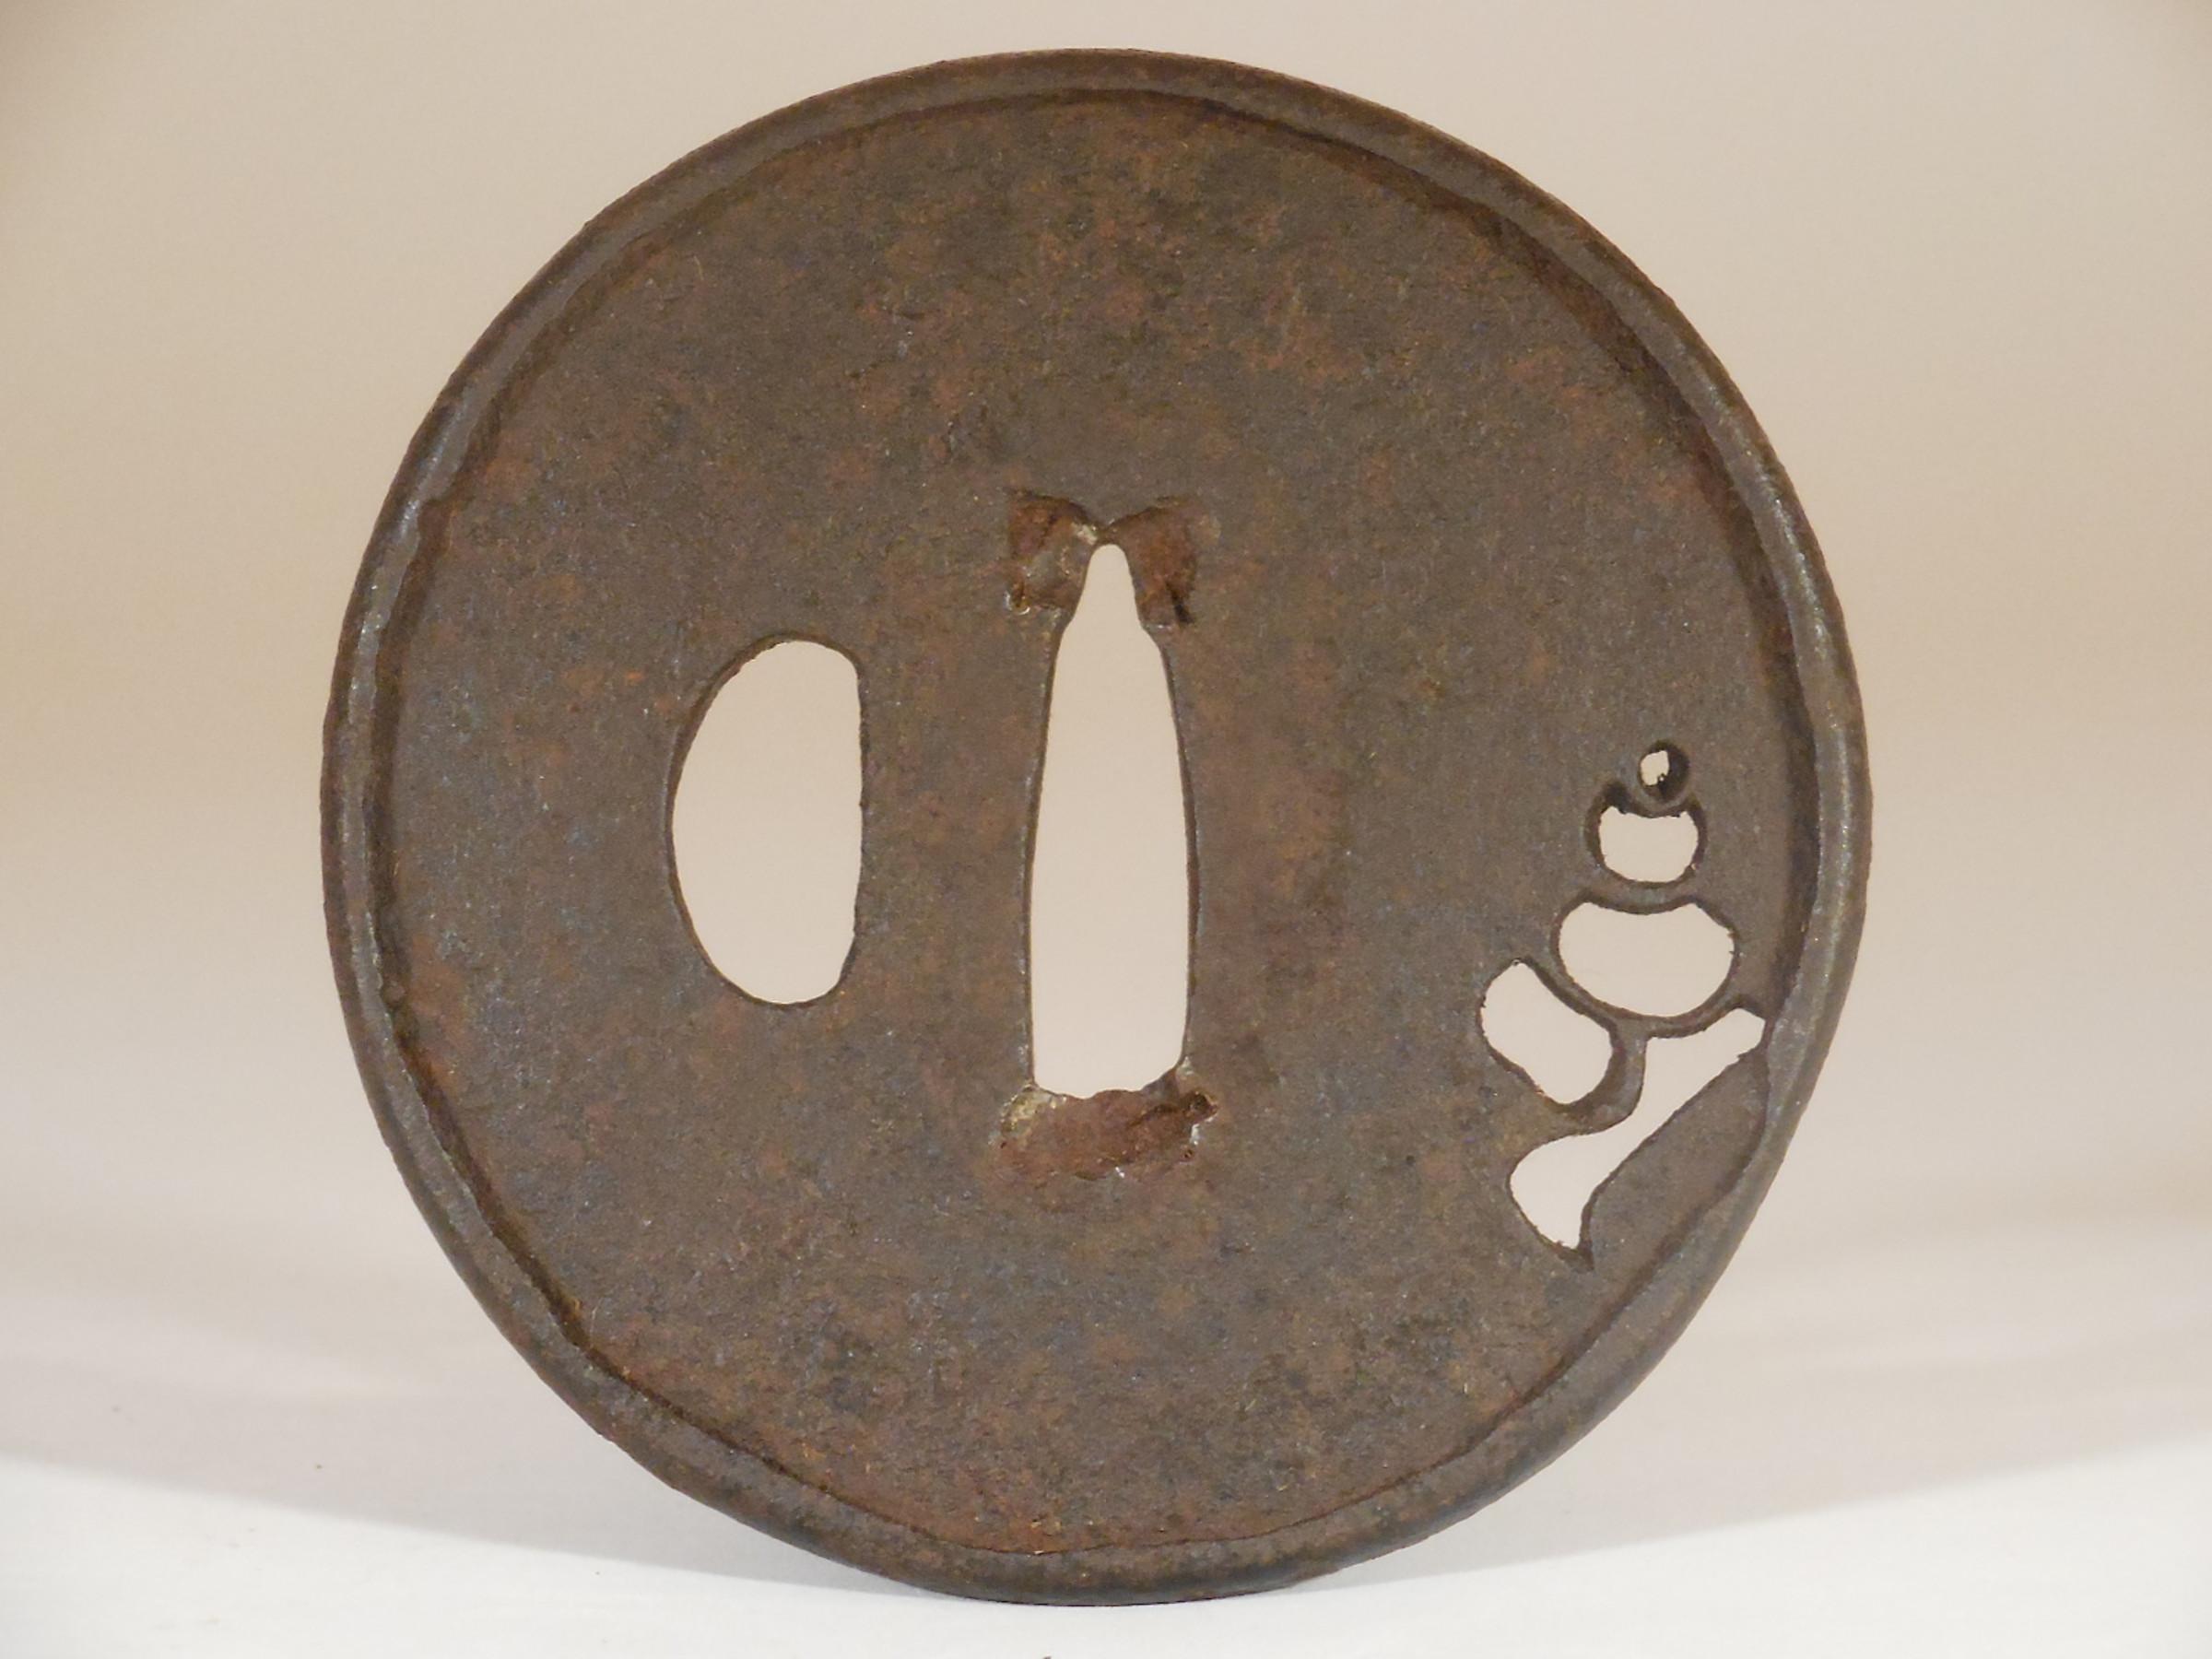 Small Ko-katchushi Iron Tsuba with Sukashi Decoration of a Conch Shell